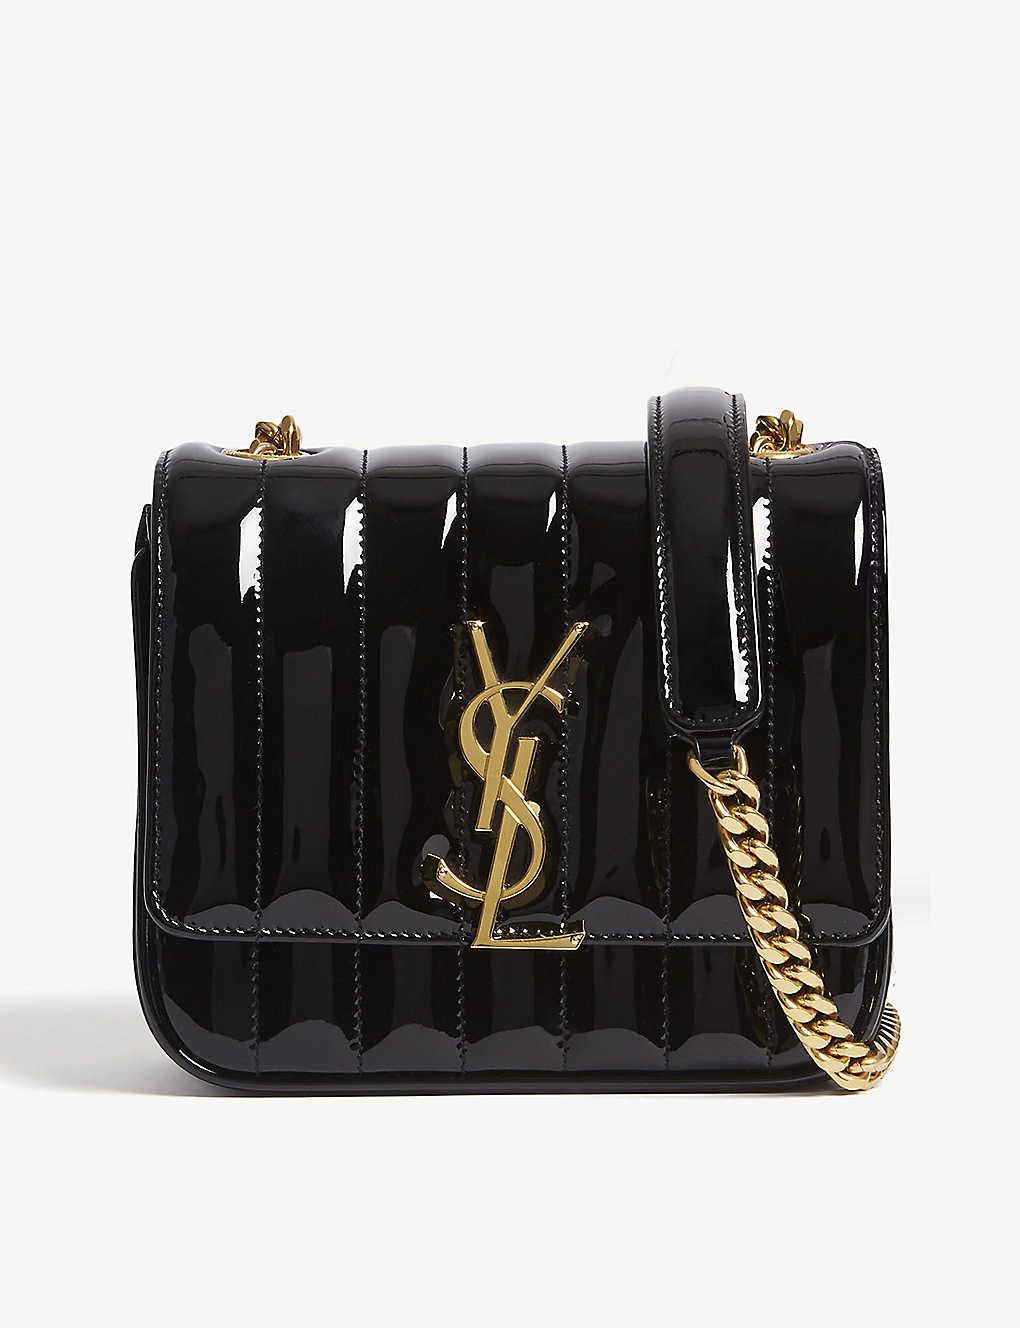 907c6207751 SAINT LAURENT - Monogram Vicky small patent leather cross-body bag ...